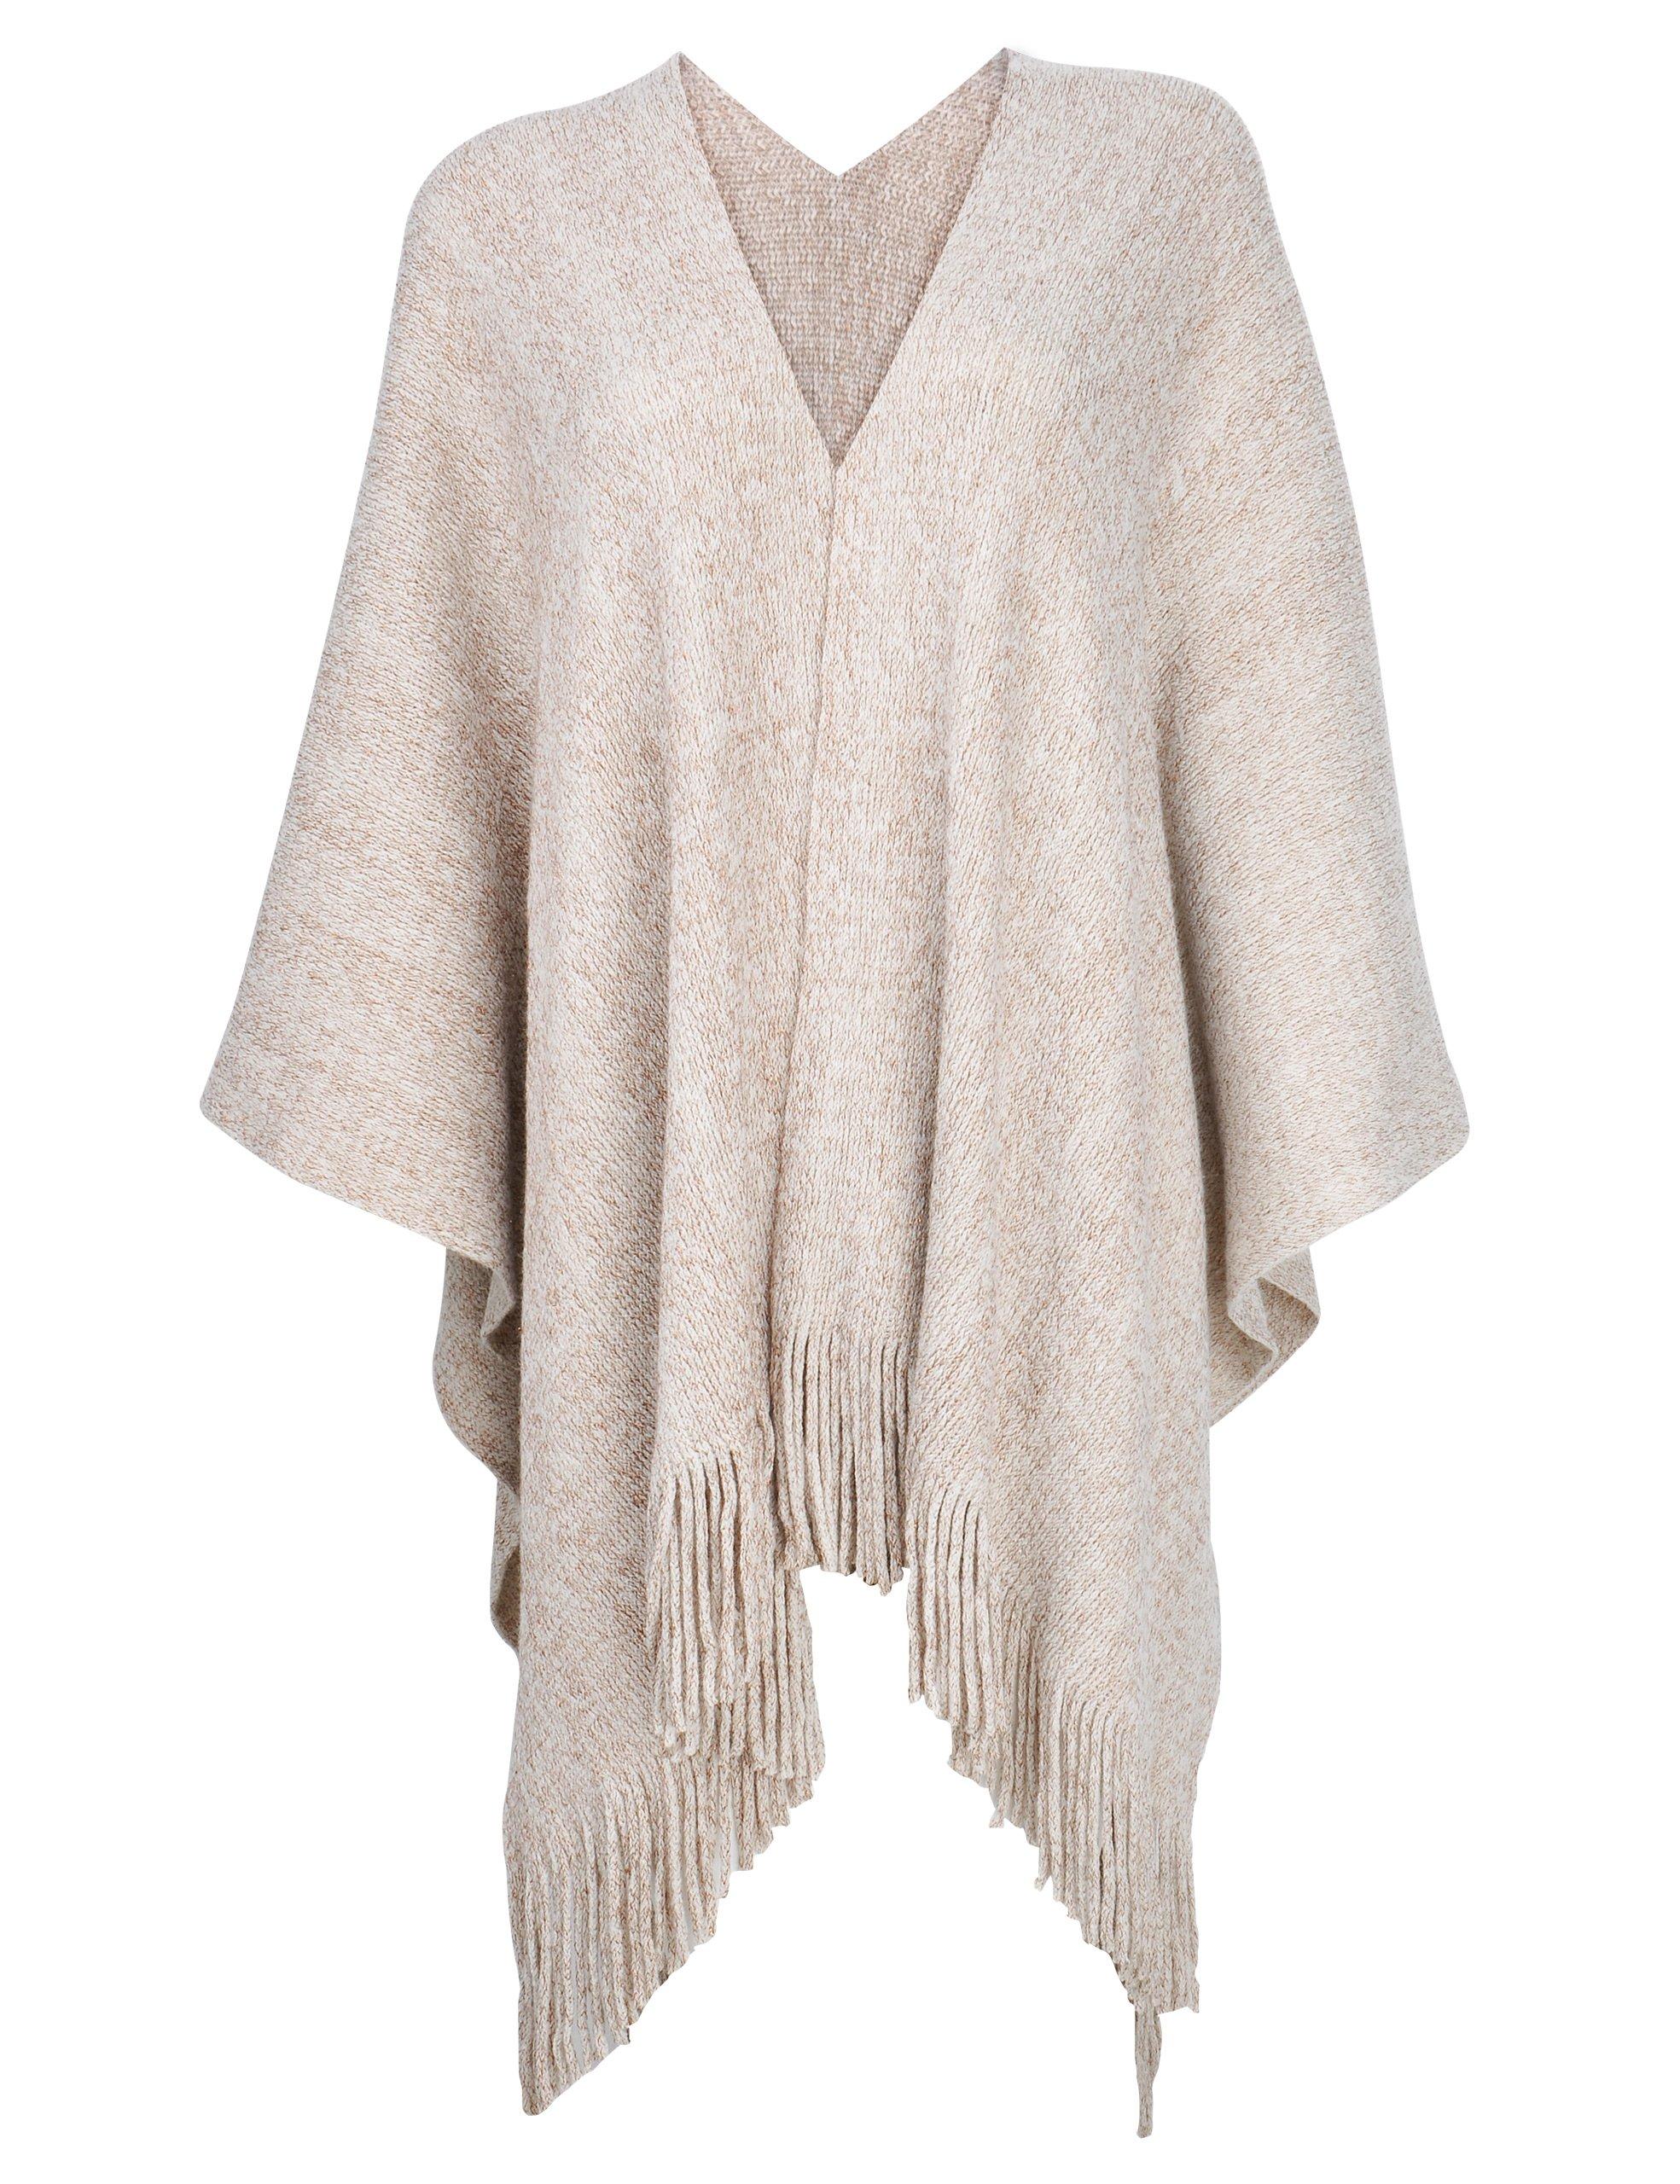 ZLYC Women's Night Sparkle Sweater Shawl Knit Blanket Wrap Open Front Fringe Poncho Cape Cardigan(Beige)